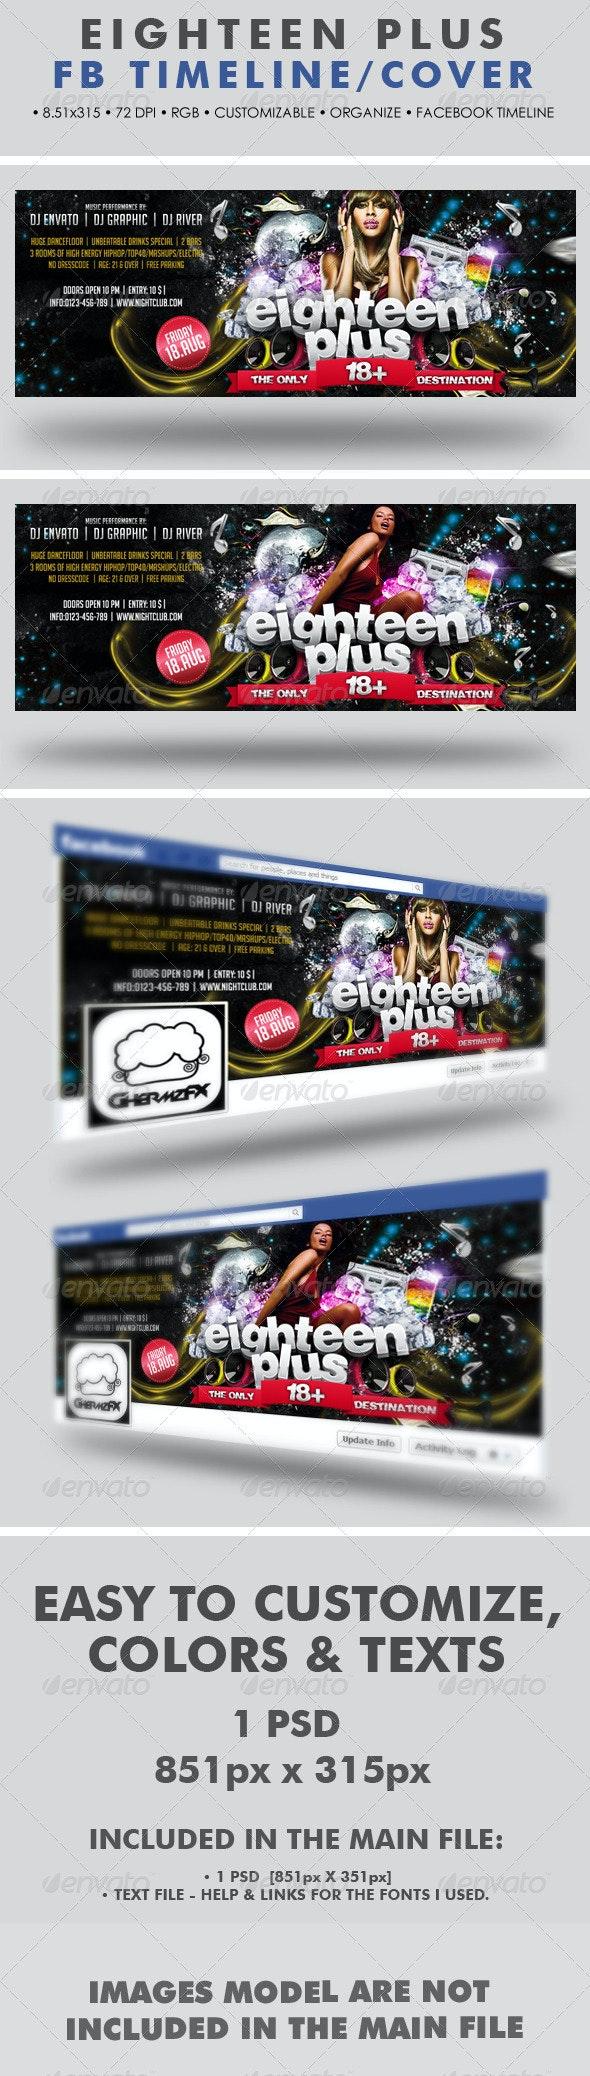 Eighteen Plus Facebook Timeline Cover - Facebook Timeline Covers Social Media